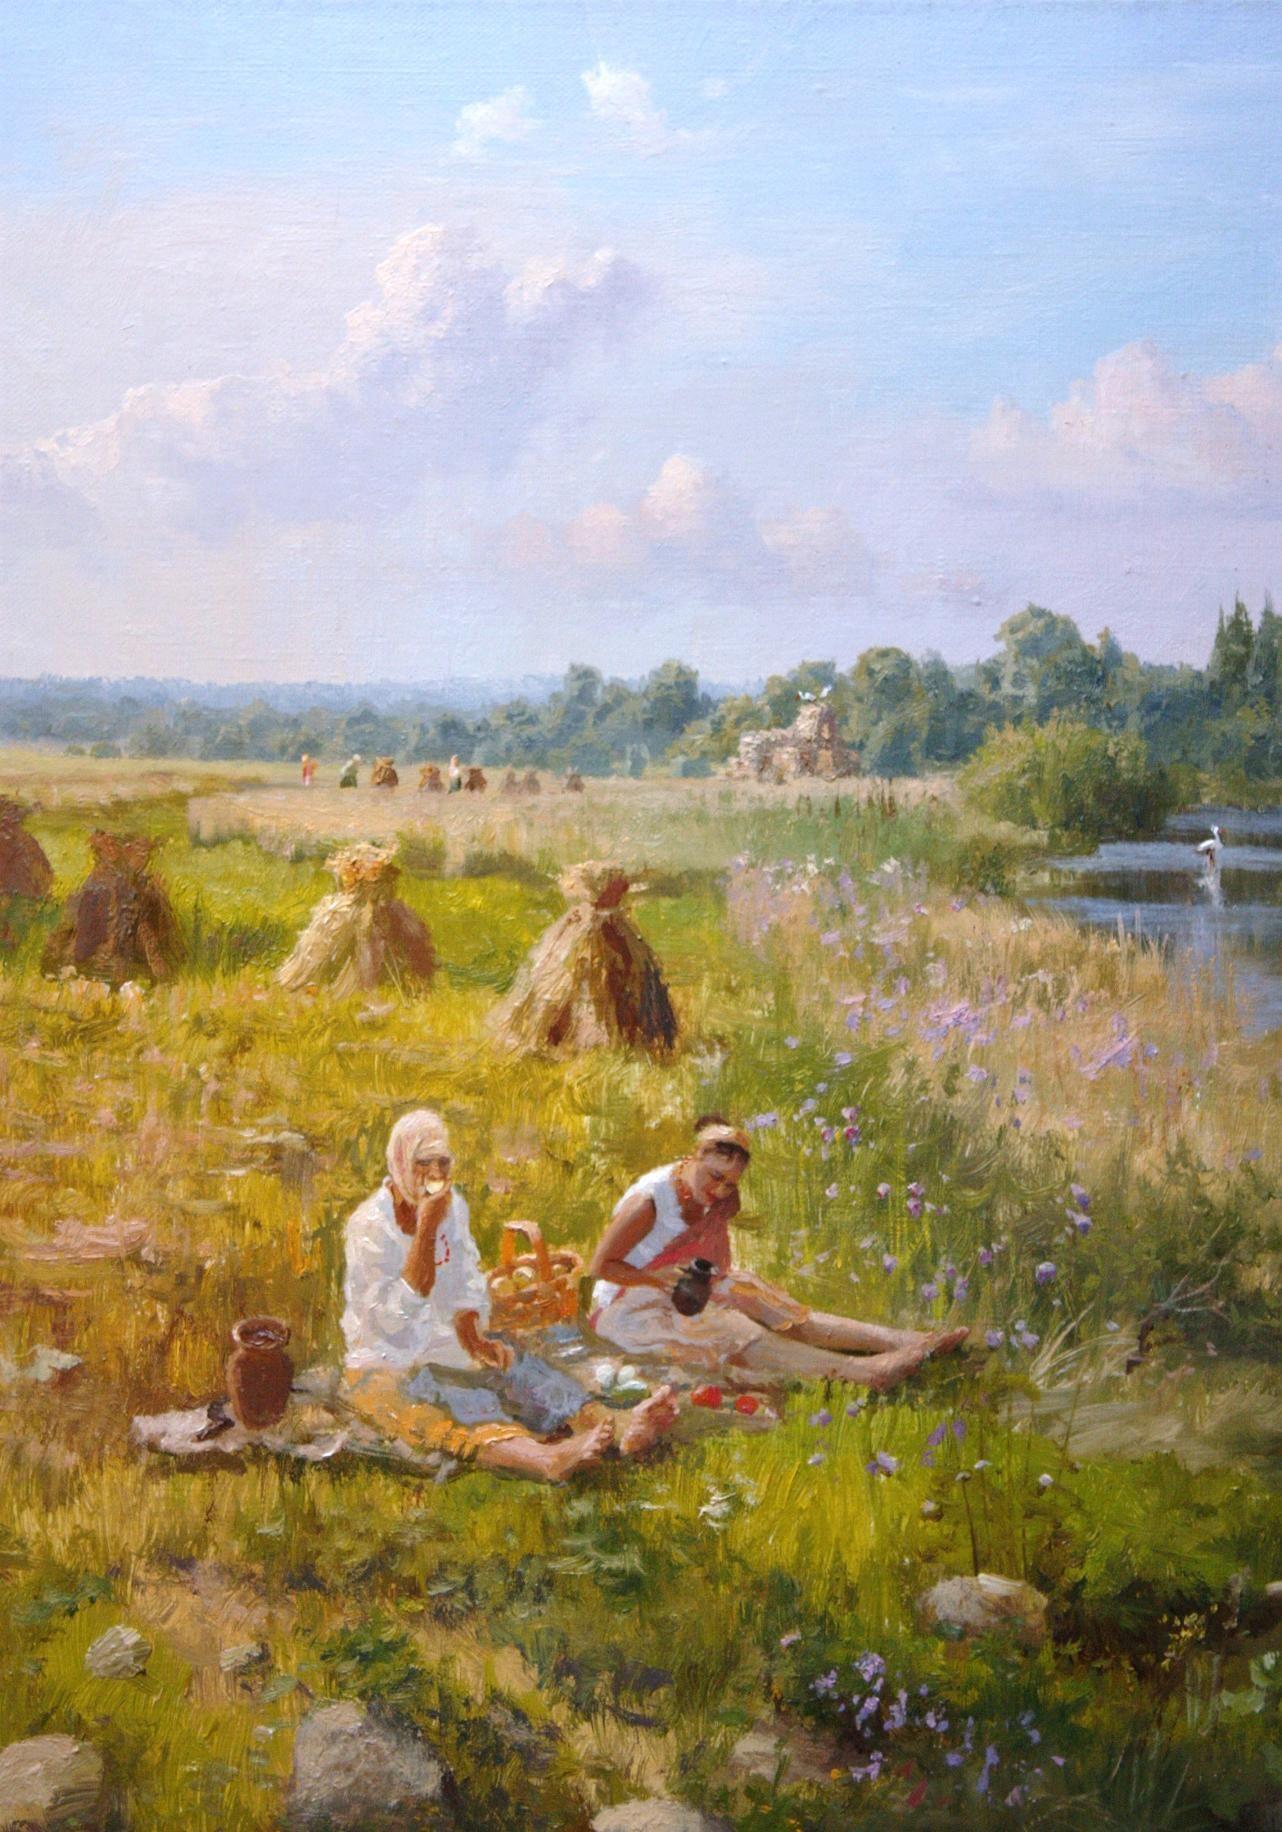 Vladimir Zhdanov: biography and paintings of the artist 42